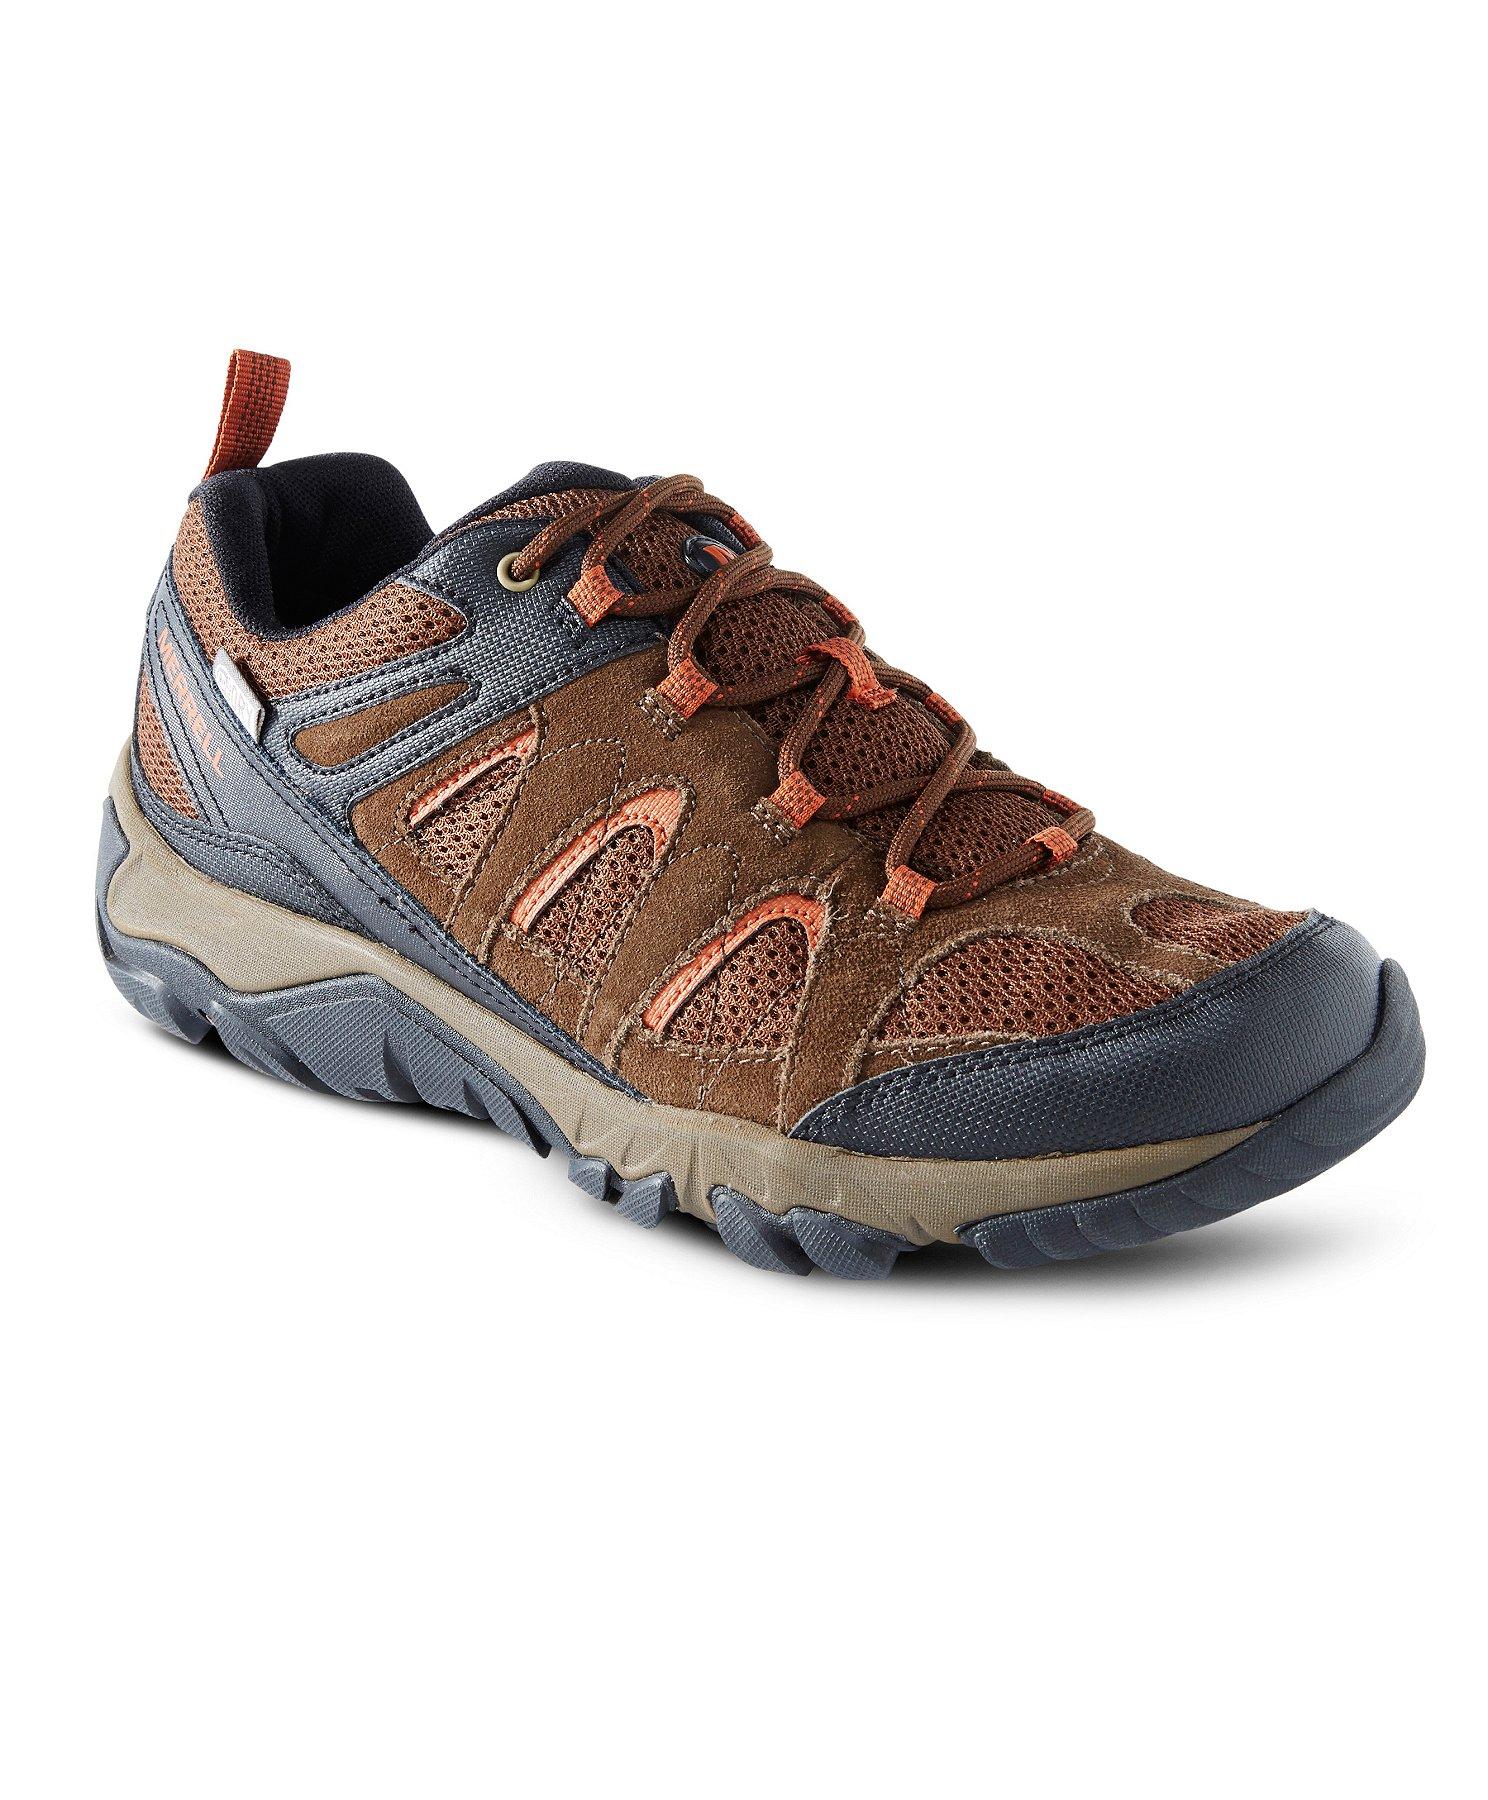 tukkukauppa ostaa suosittuja Alin hinta Men's Outmost Waterproof Hiking Shoes - Wide